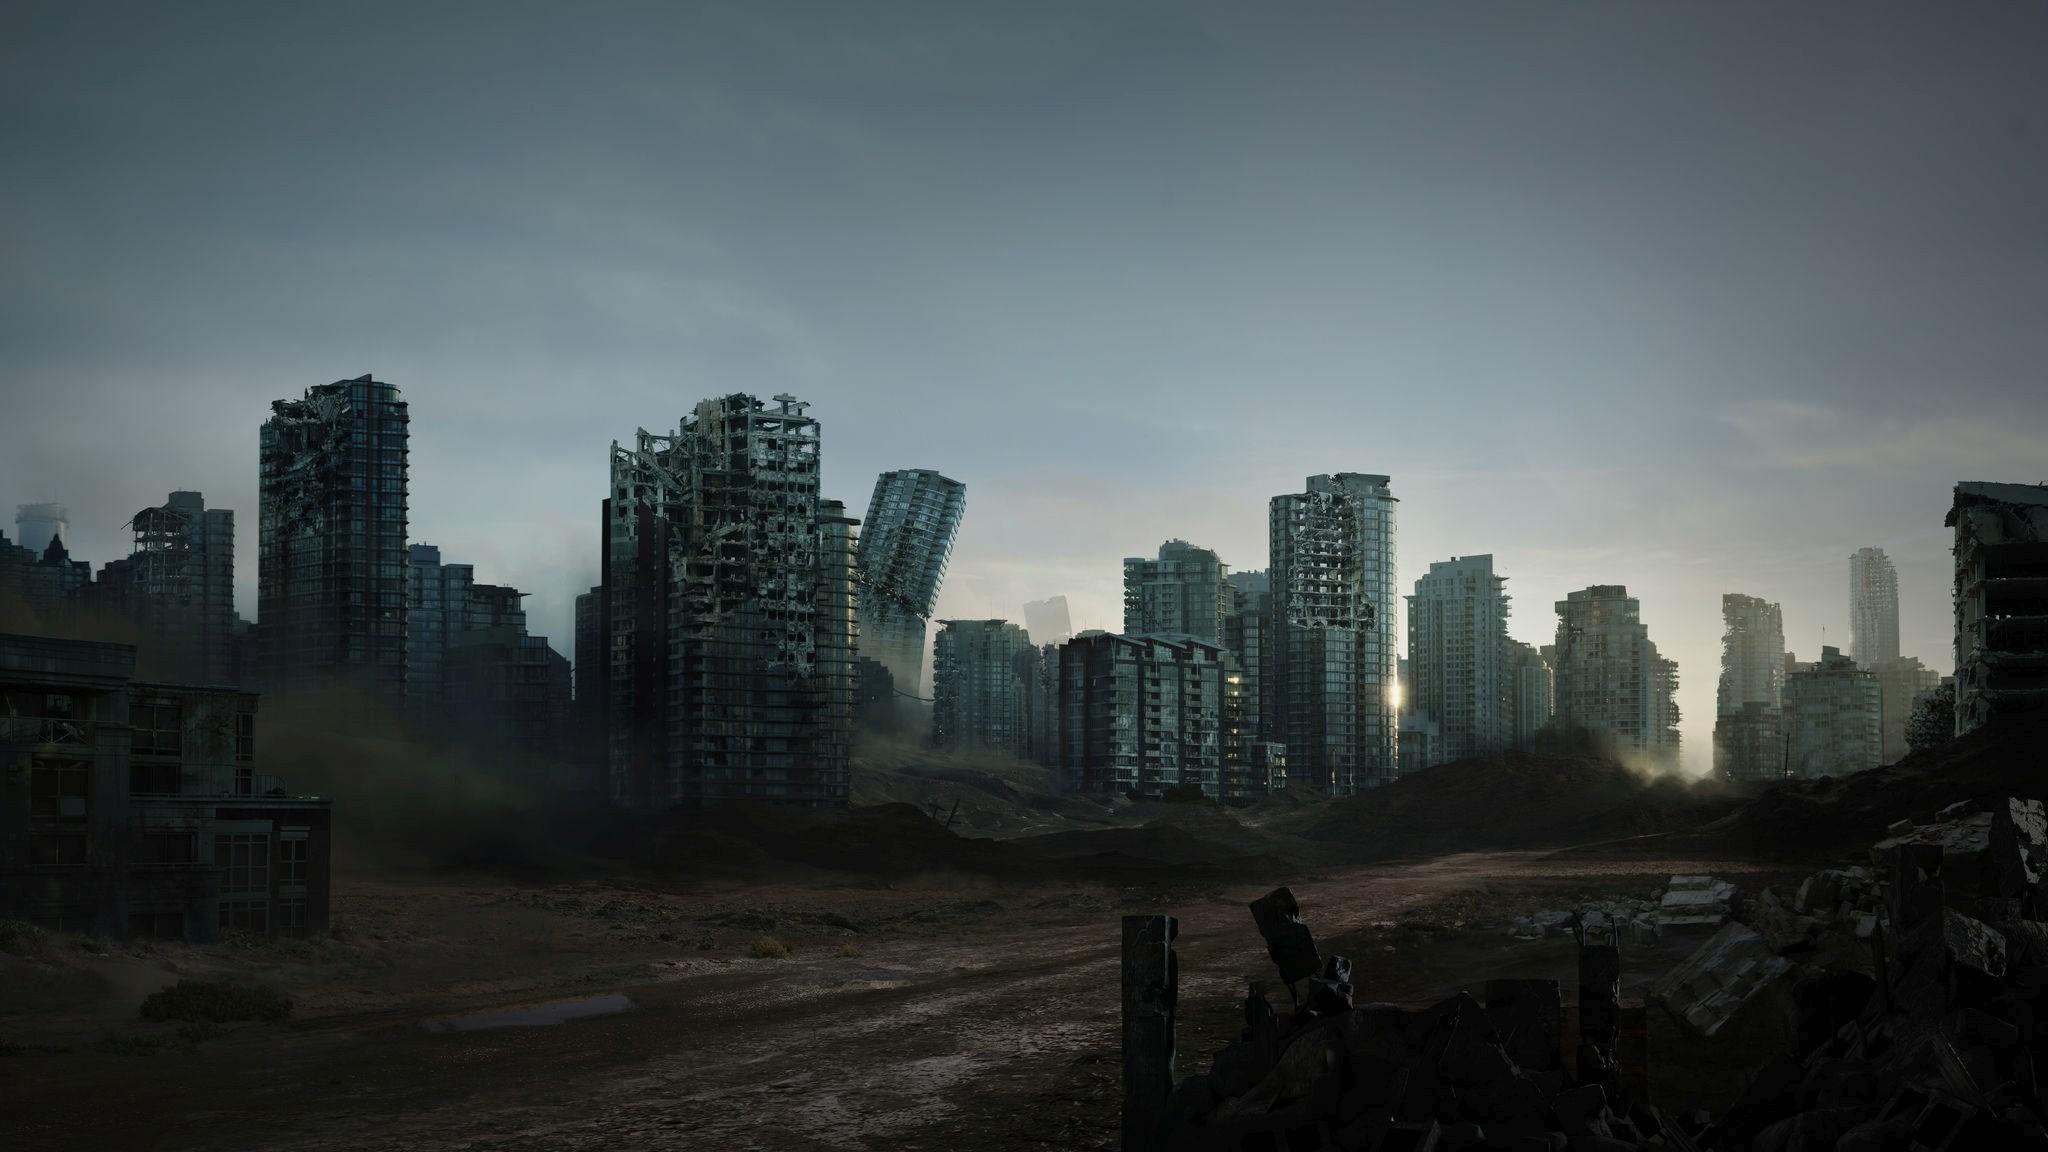 City Of Silence Full HD Wallpaper